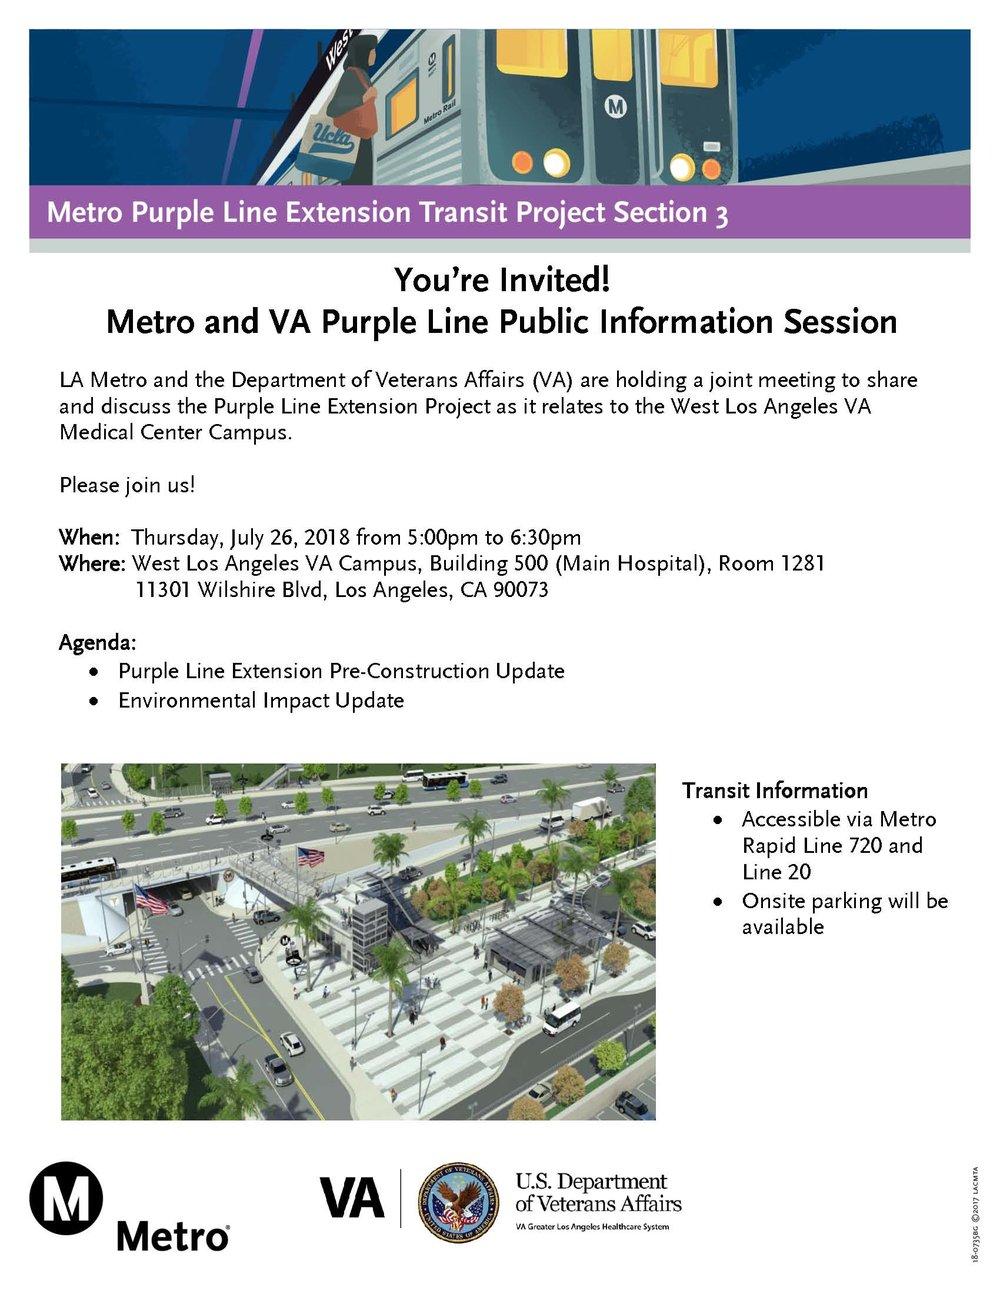 Metro-VA Joint Outreach Meeting - 7.26.18.jpg